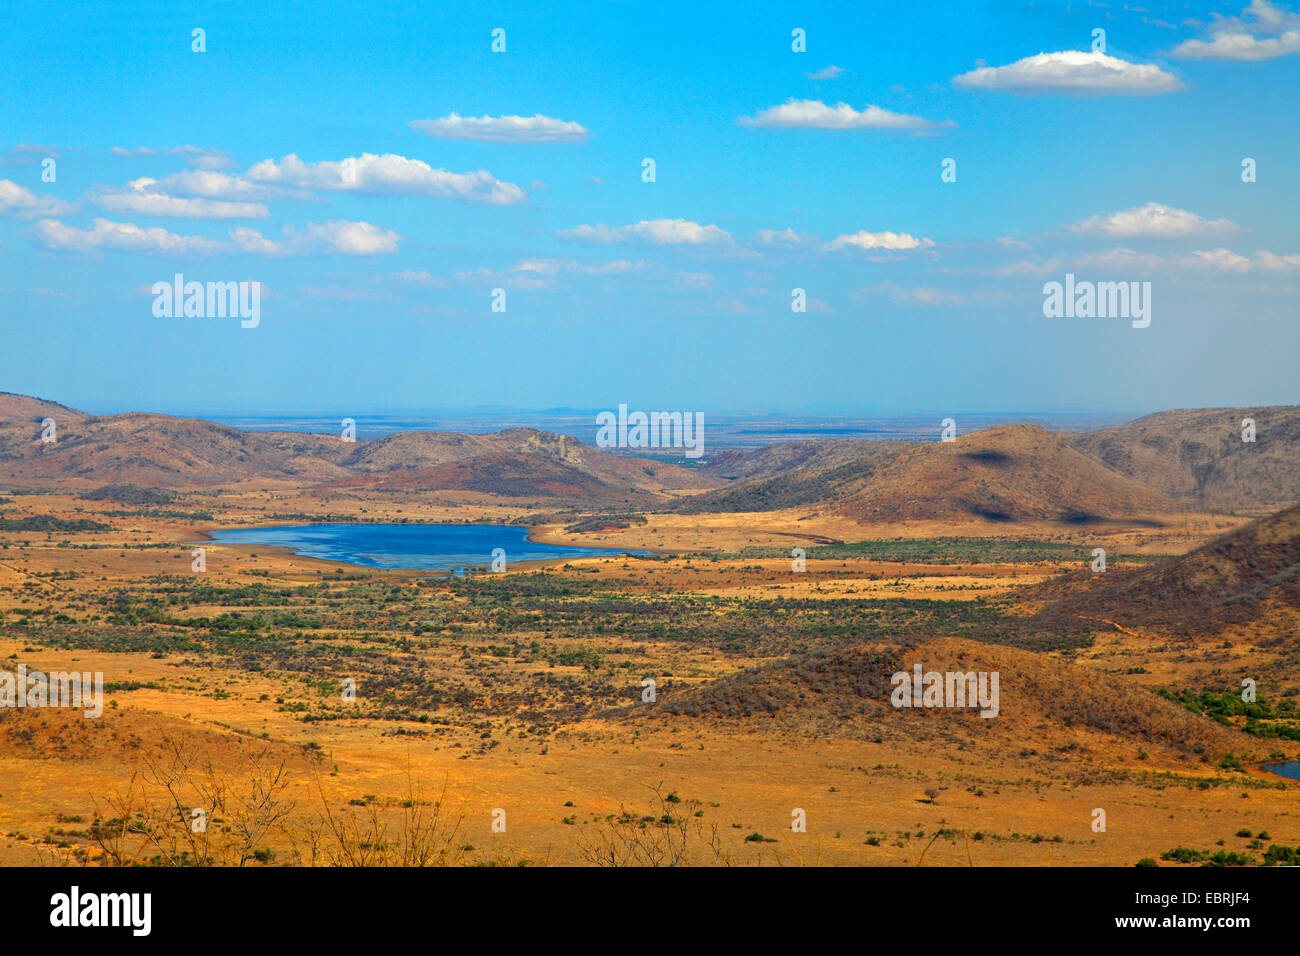 Blick vom Lenong Sicht auf Mankwe See, Süd-Afrika, North West Province, Pilanesberg National Park Stockbild